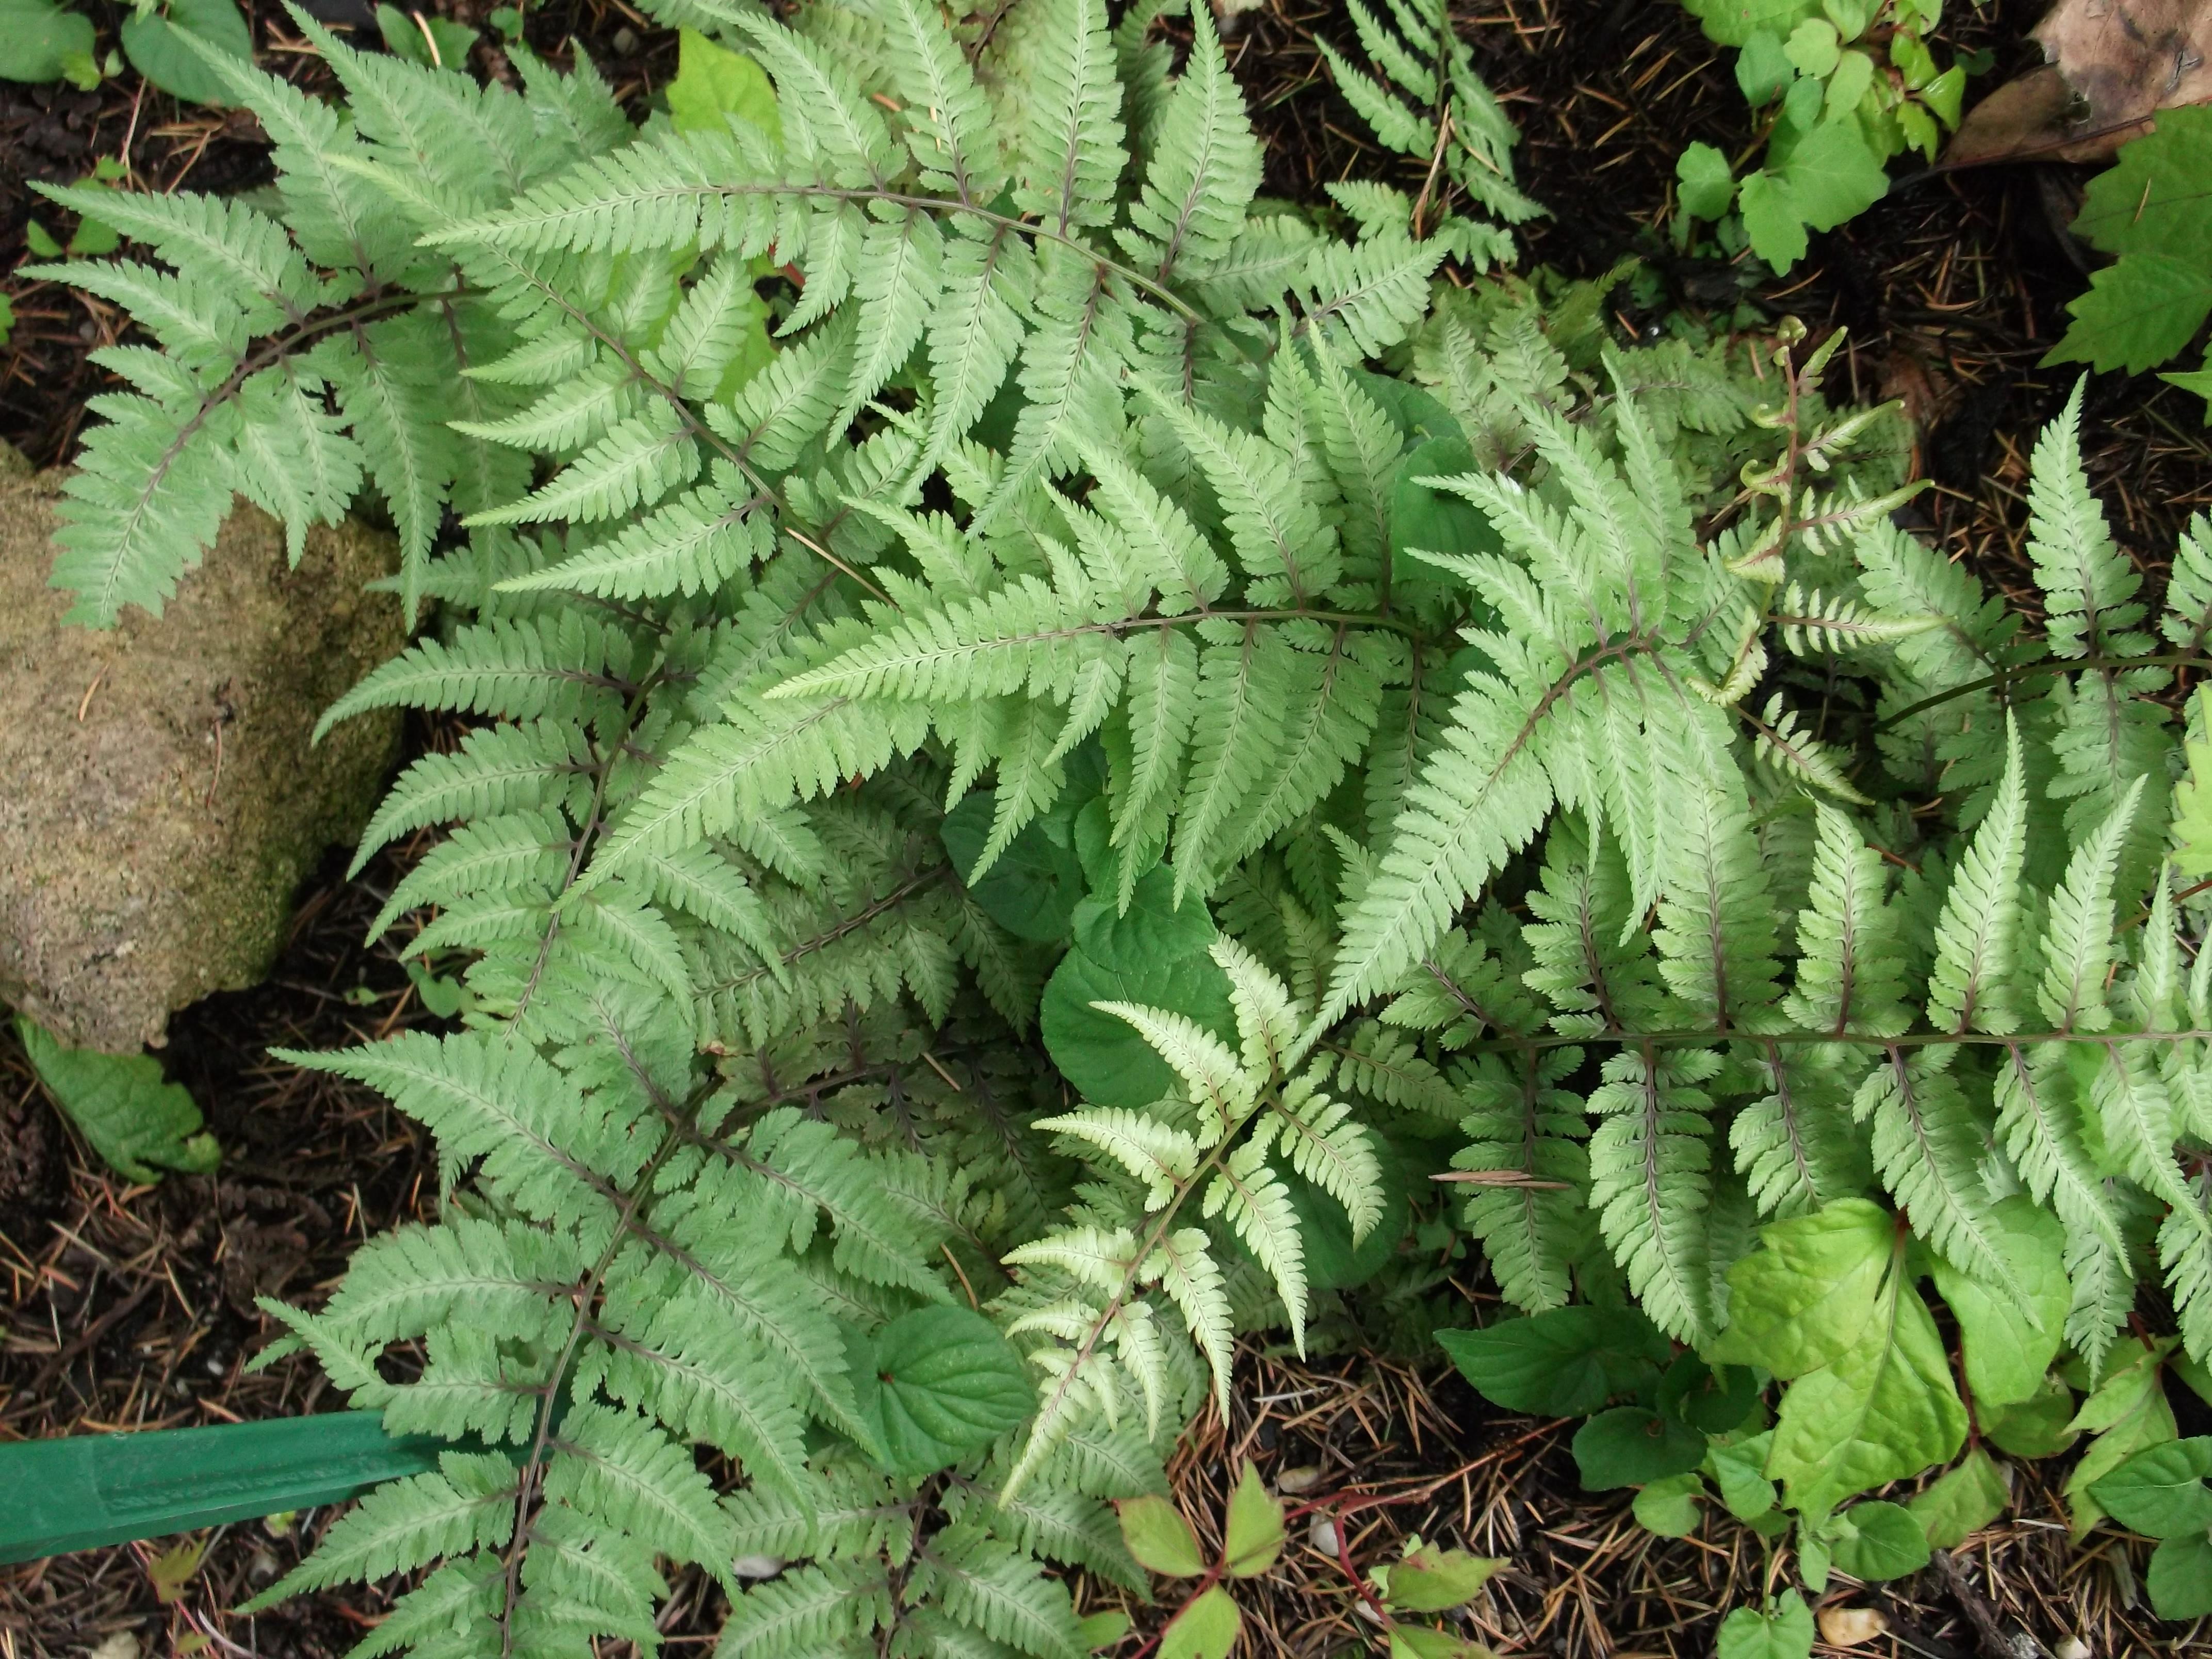 Foug res conseil jardinage application en phytoth rapie for Conseil jardinage